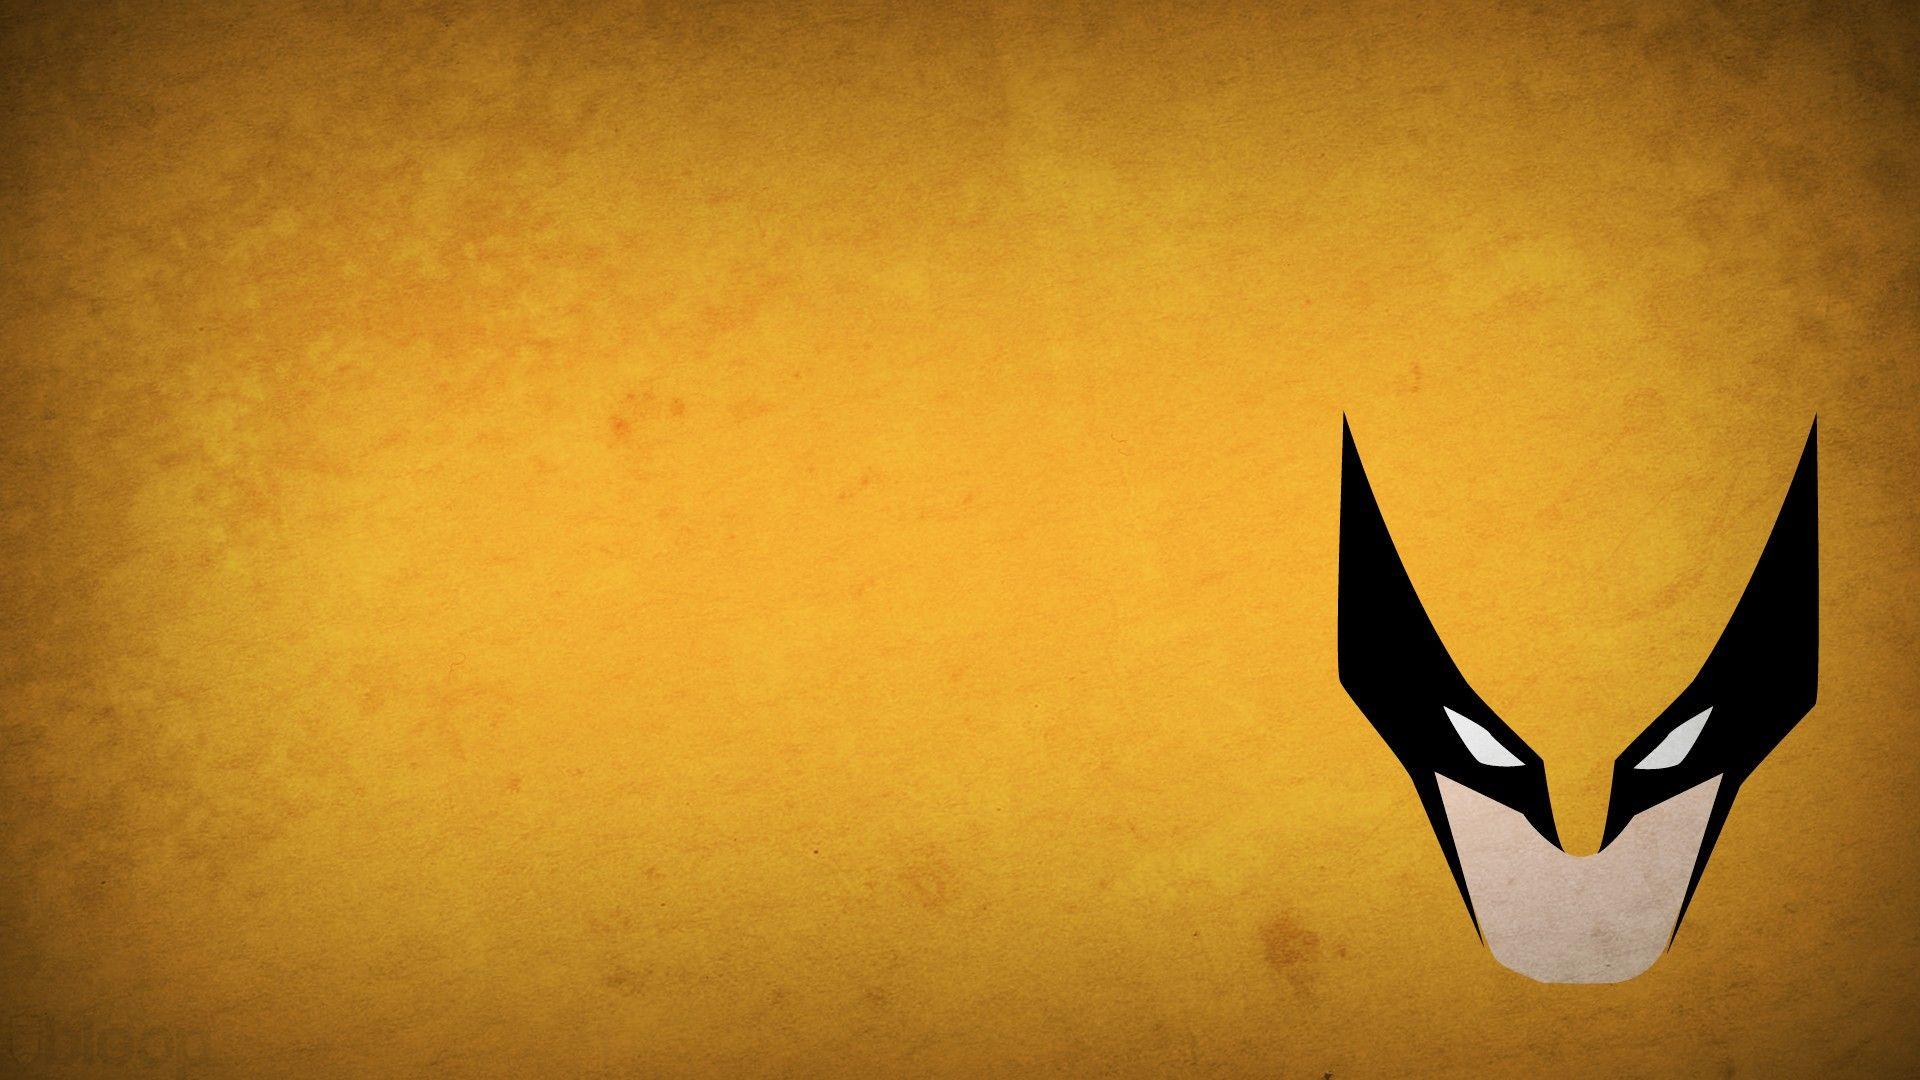 Superheroes Minimalistic Hi Res Wallpapers Superhero Wallpaper Dc Comics Wallpaper Wolverine